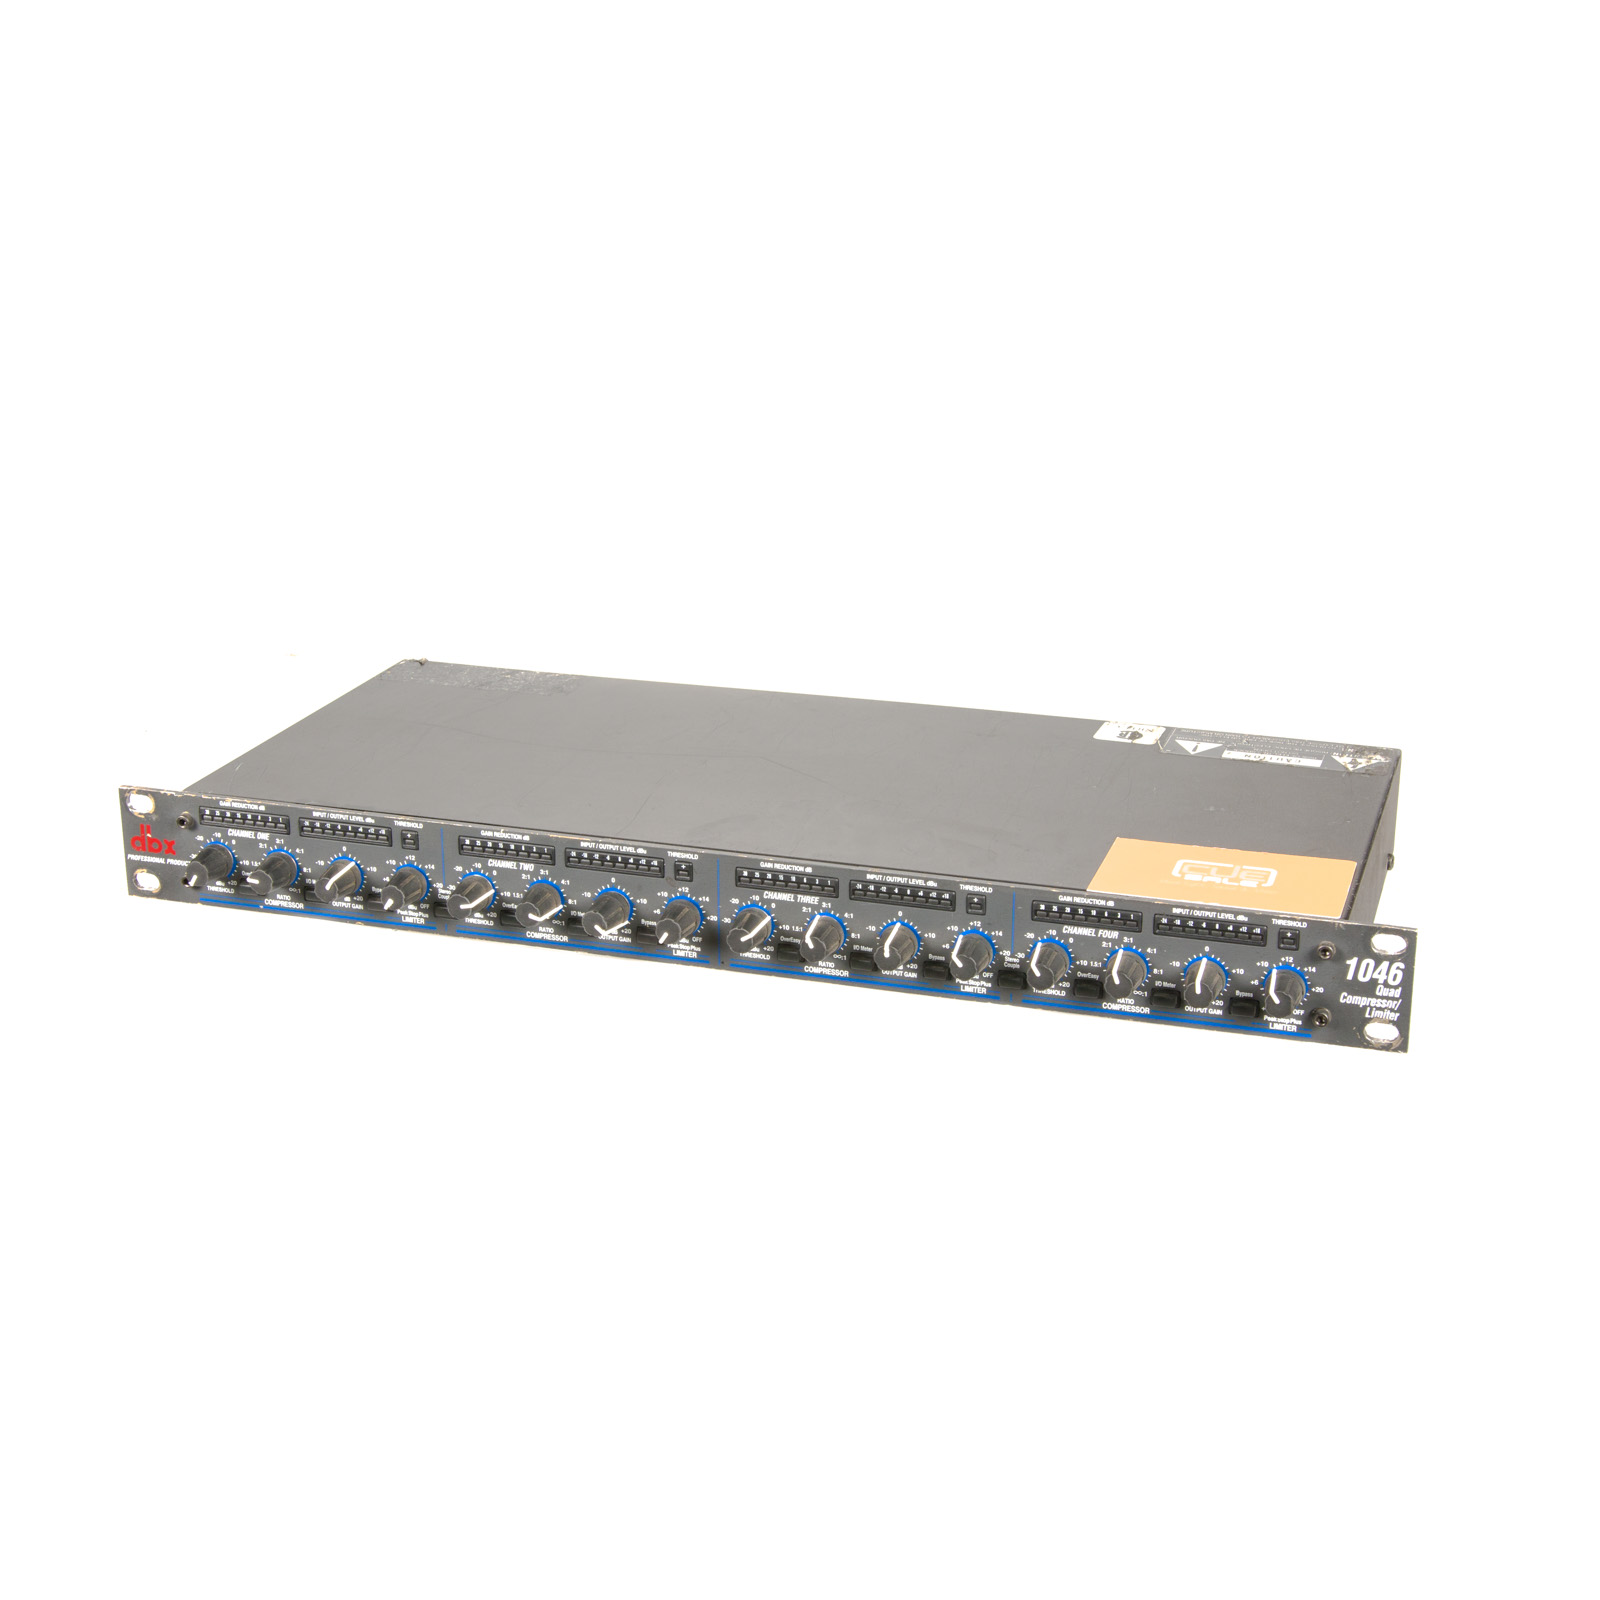 DBX 1046 Quad Compressor / Limiter